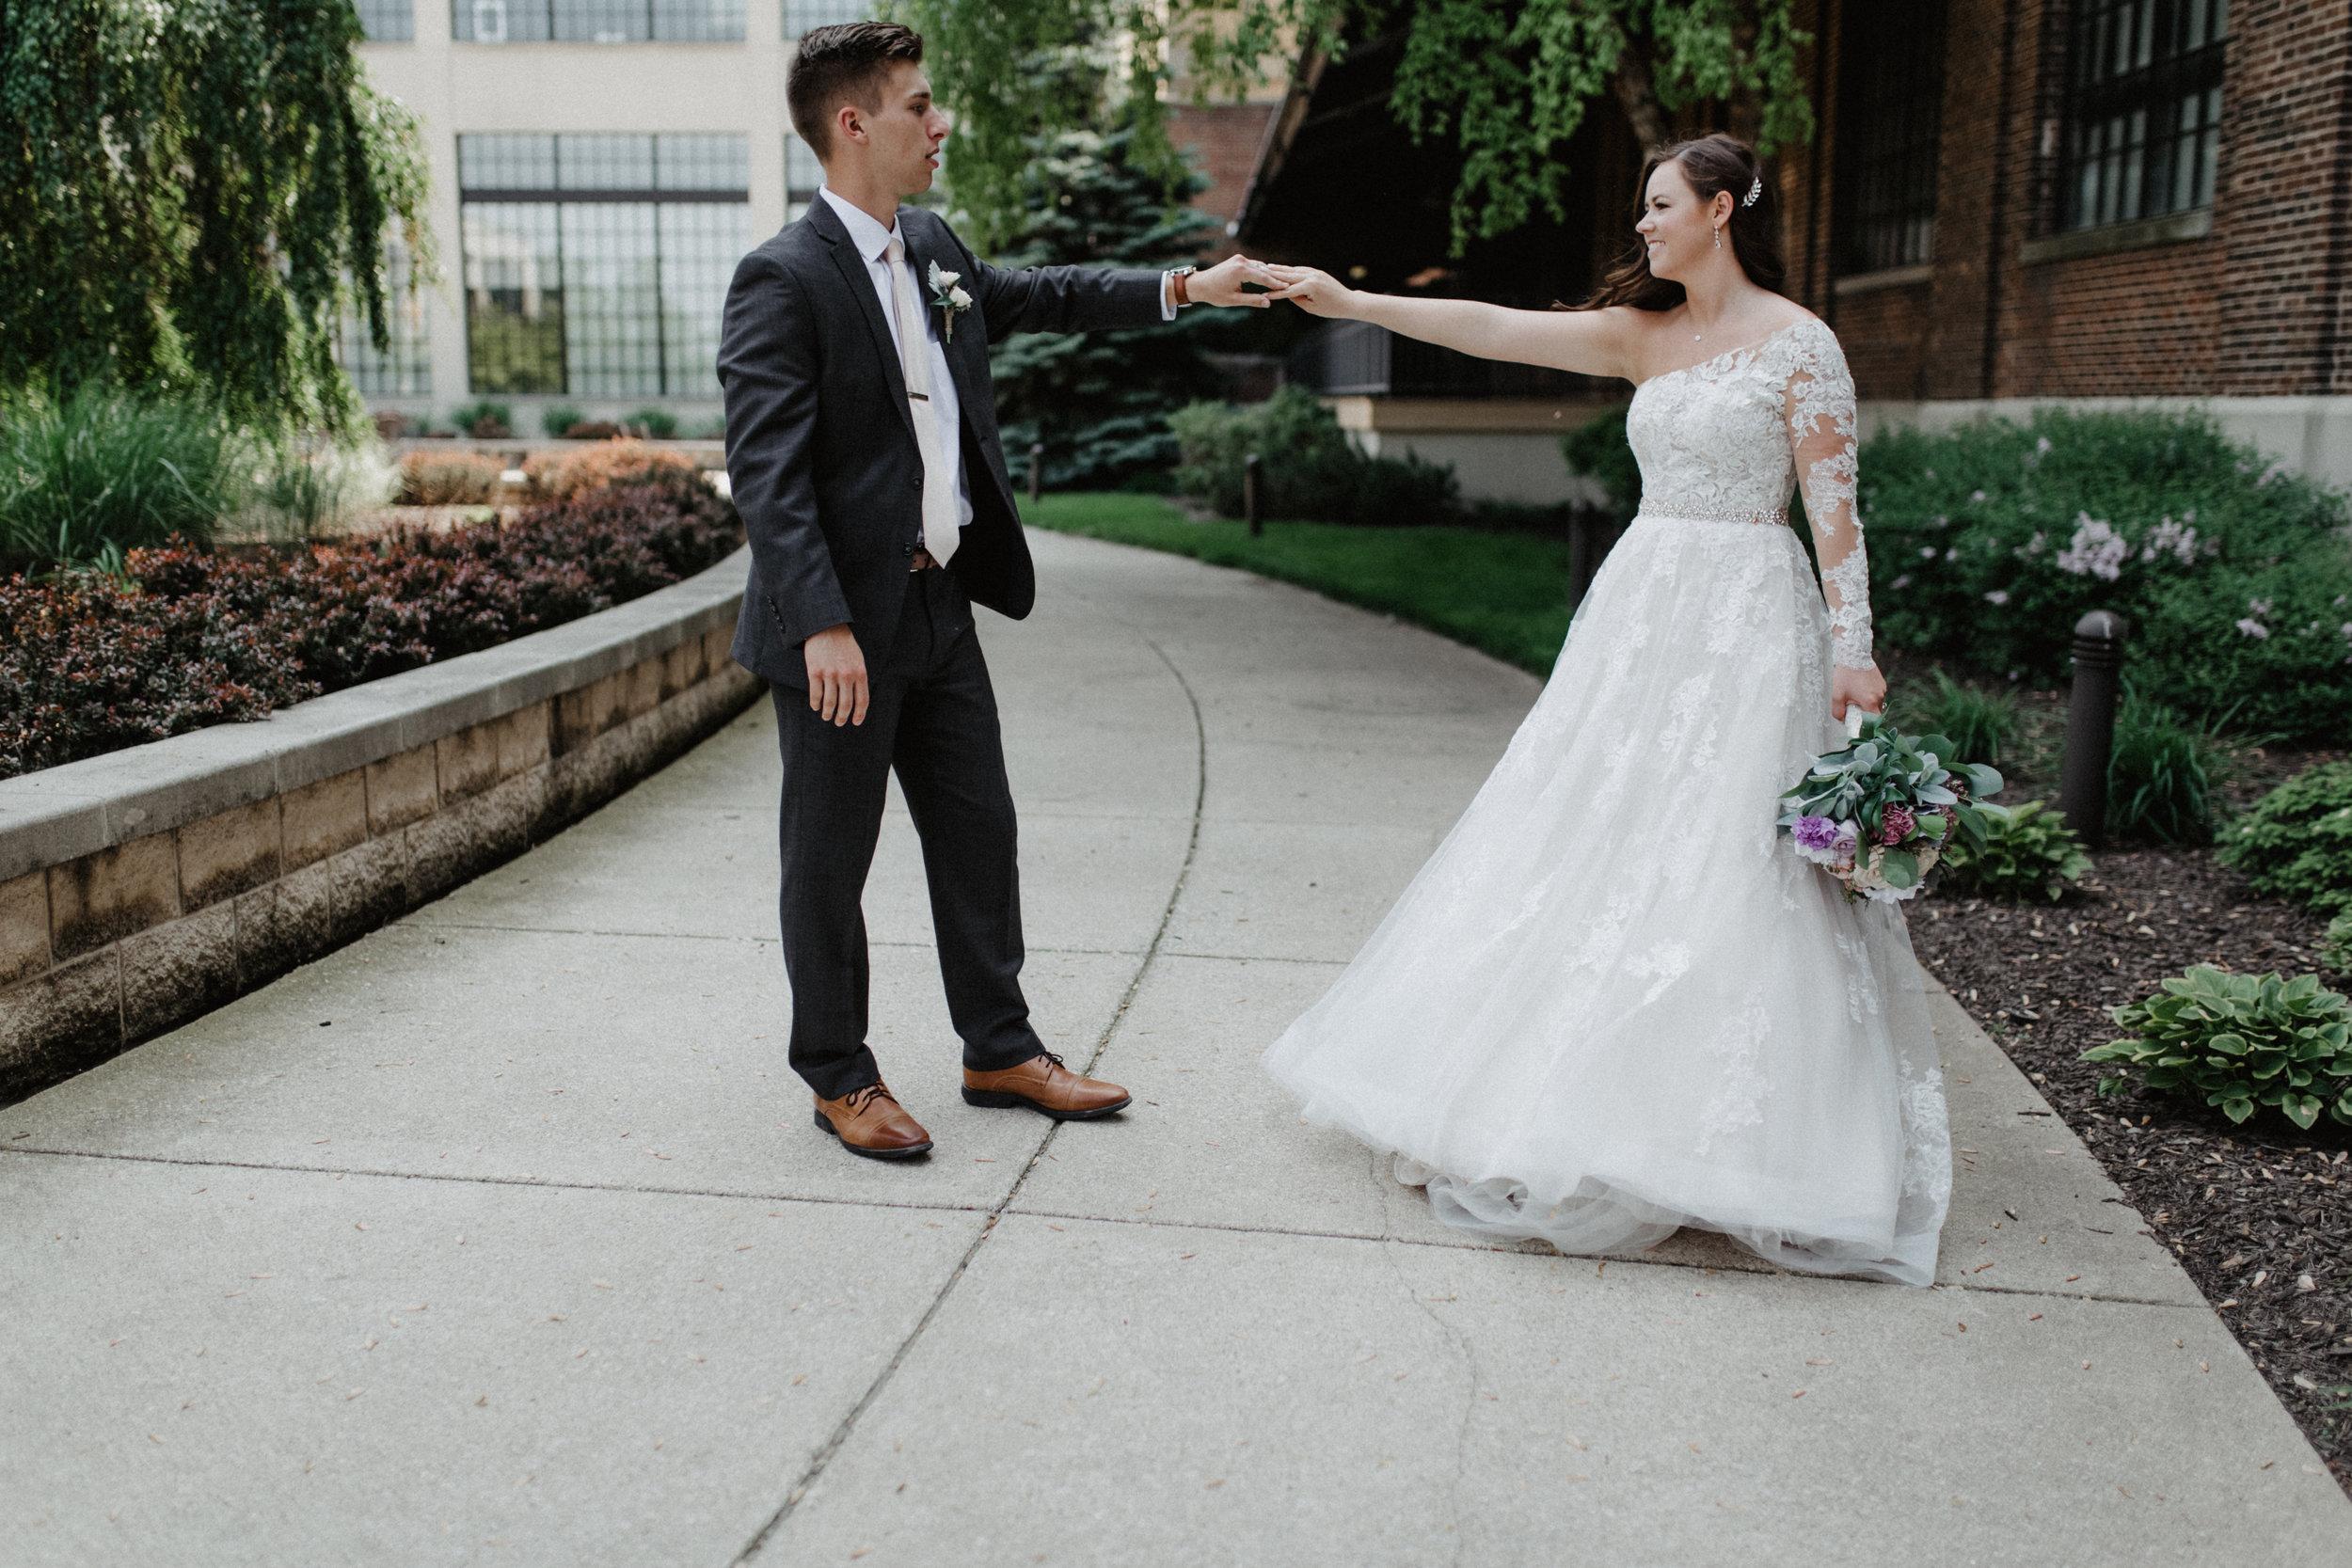 GRAYCENTOMHAMILTON-GRAND-RAPIDS-WEDDING-PHOTOGRAPHY-35.jpg